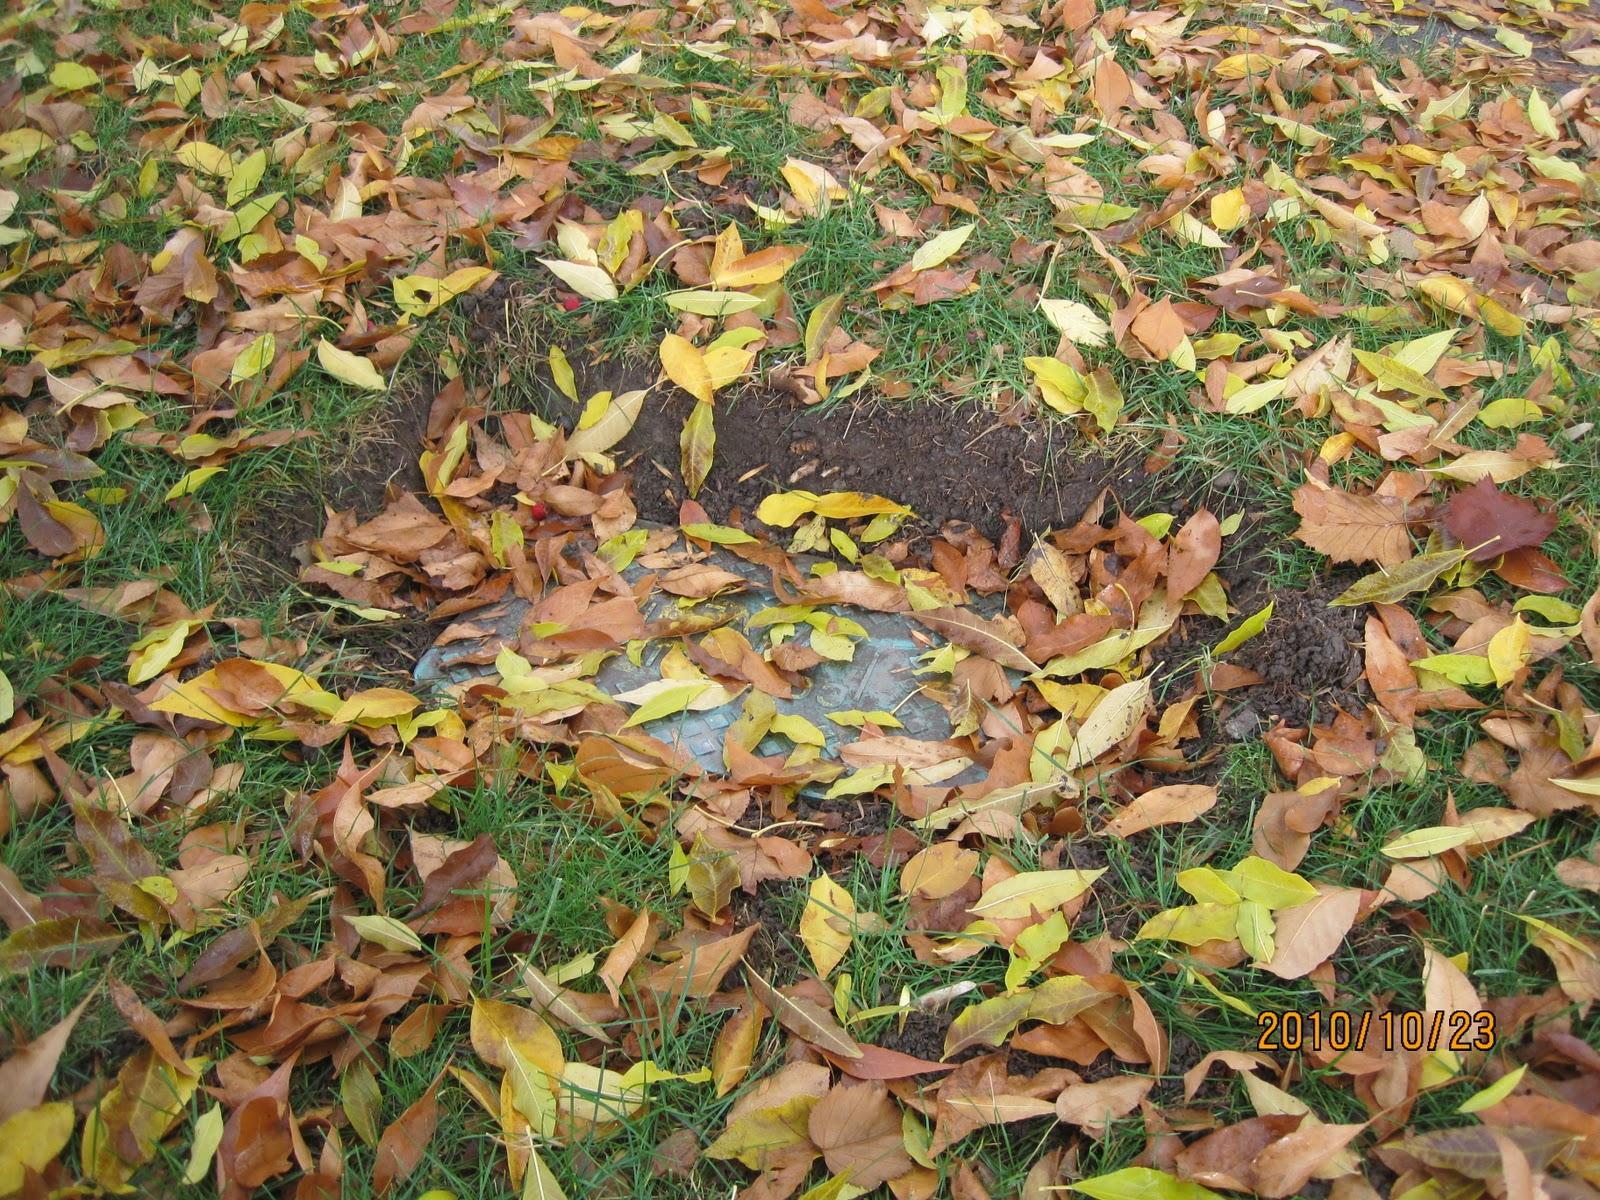 Swift\'s Gardening Blog - Swift Horticultural Enterprises, LLC: Are ...